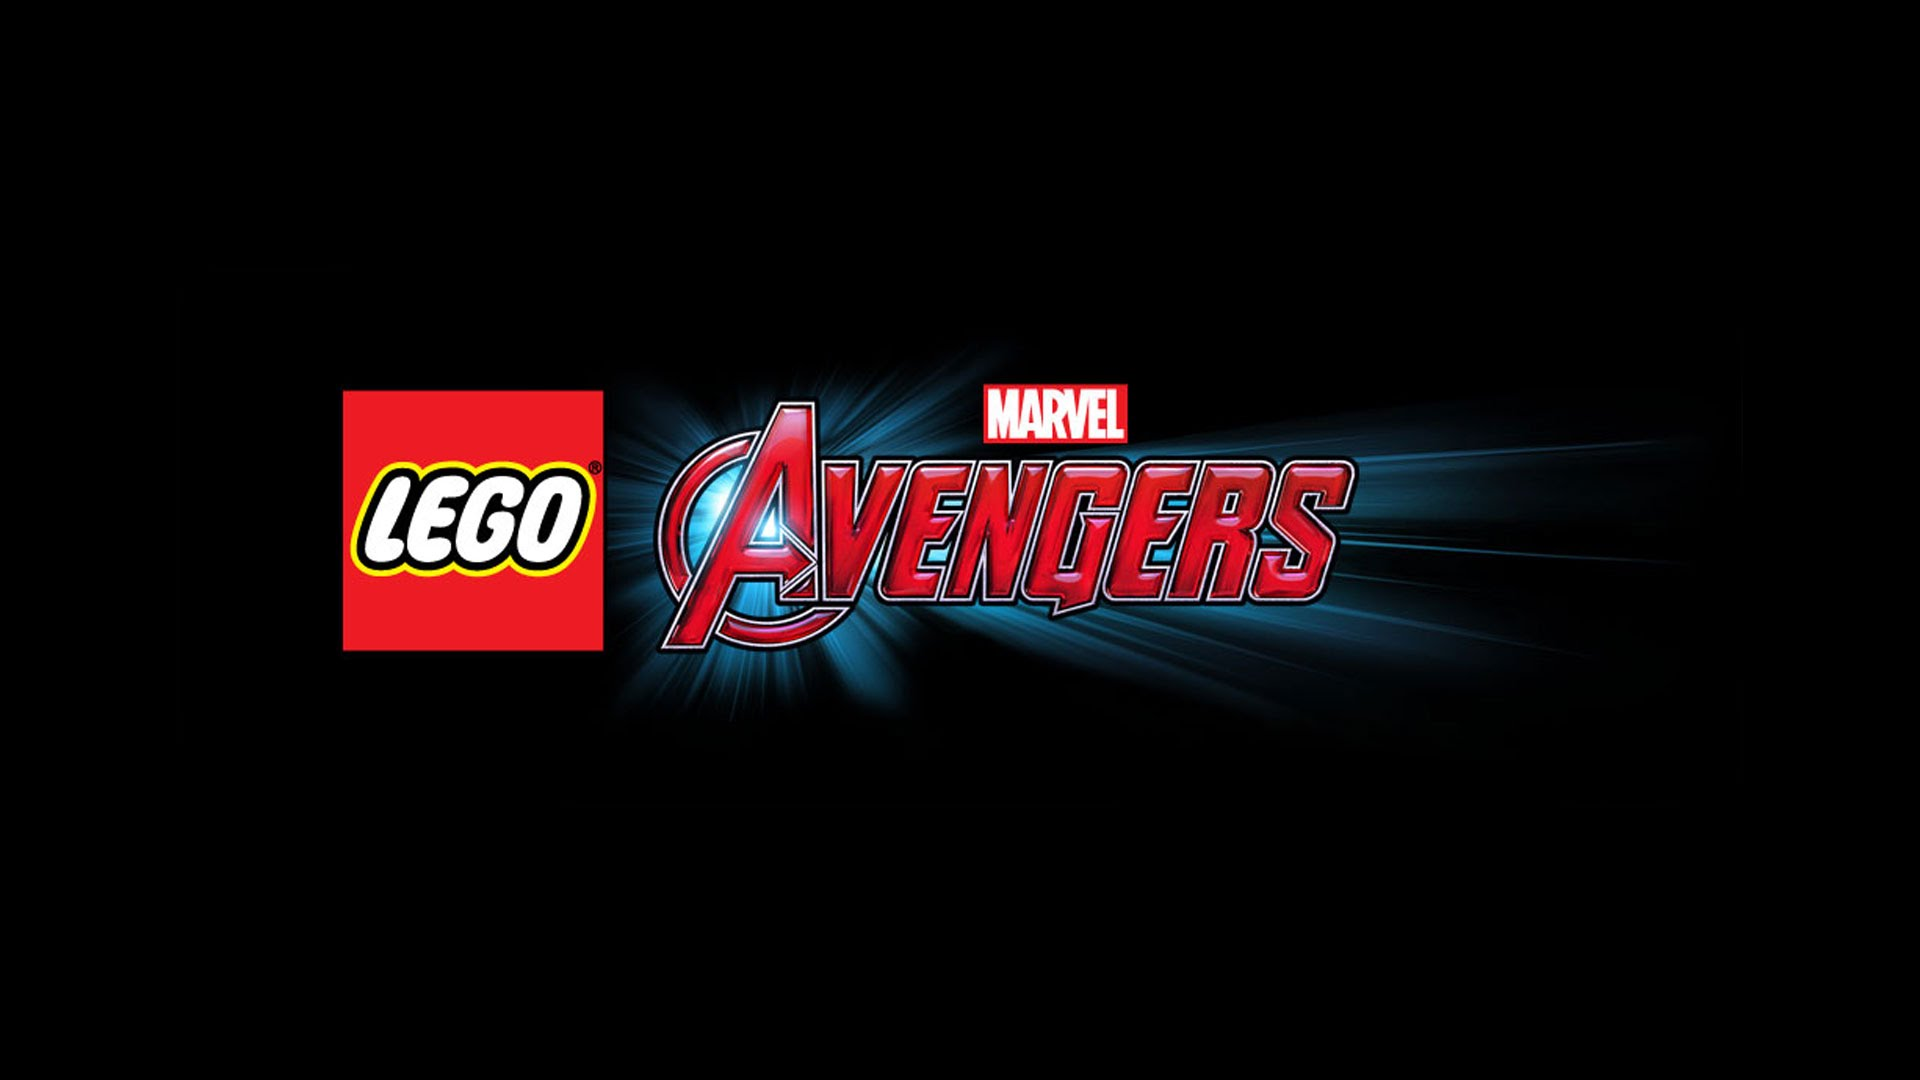 LEGO Avengers gets a trailer! – HTG